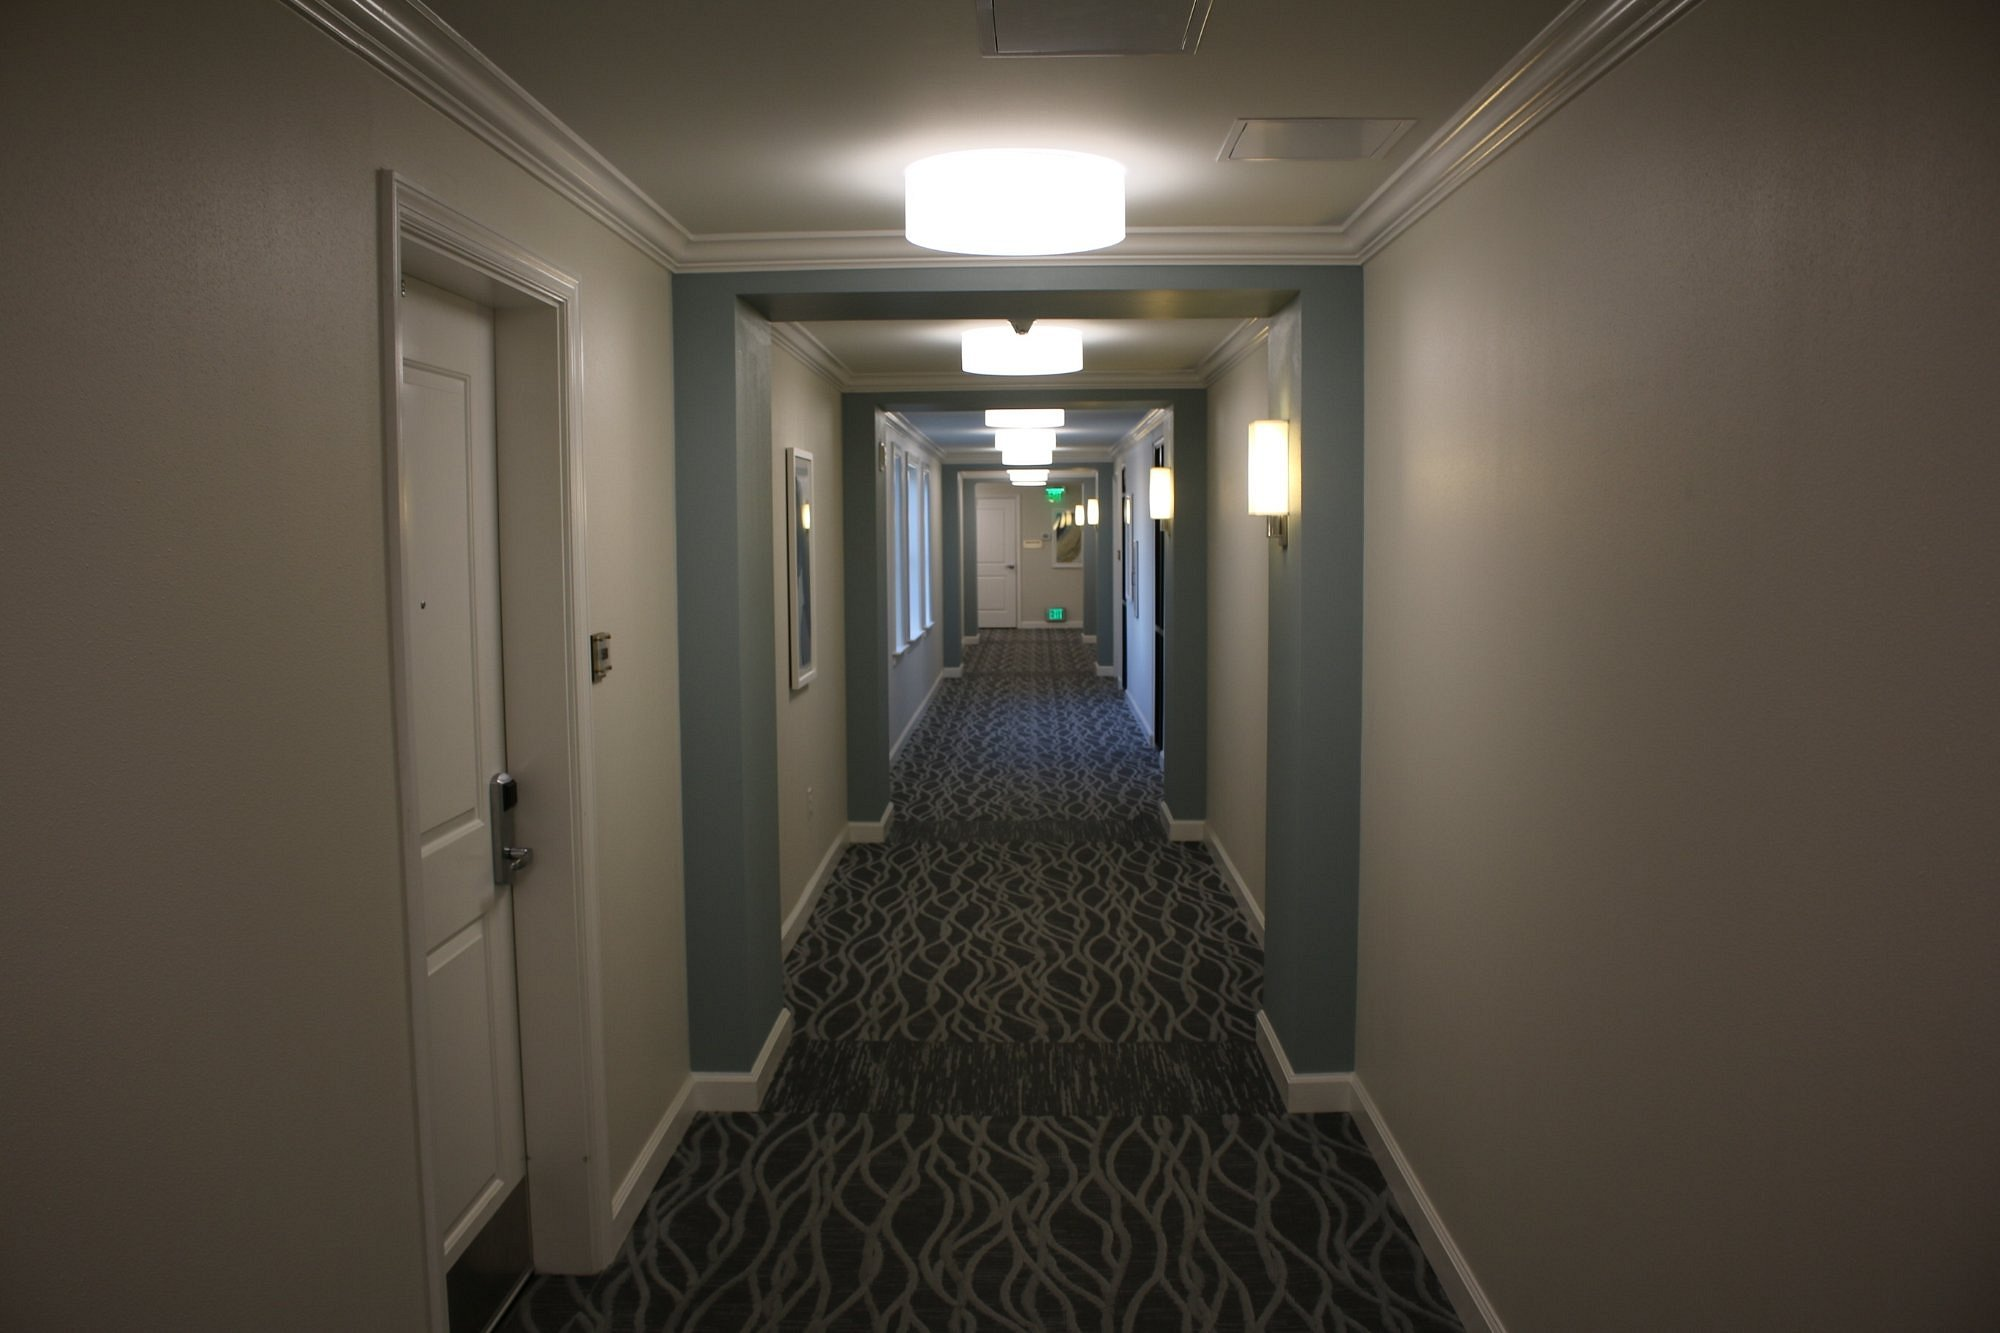 Bluegreen_Vacations_King_Street_Resort_Hallway_1325917261.jpg